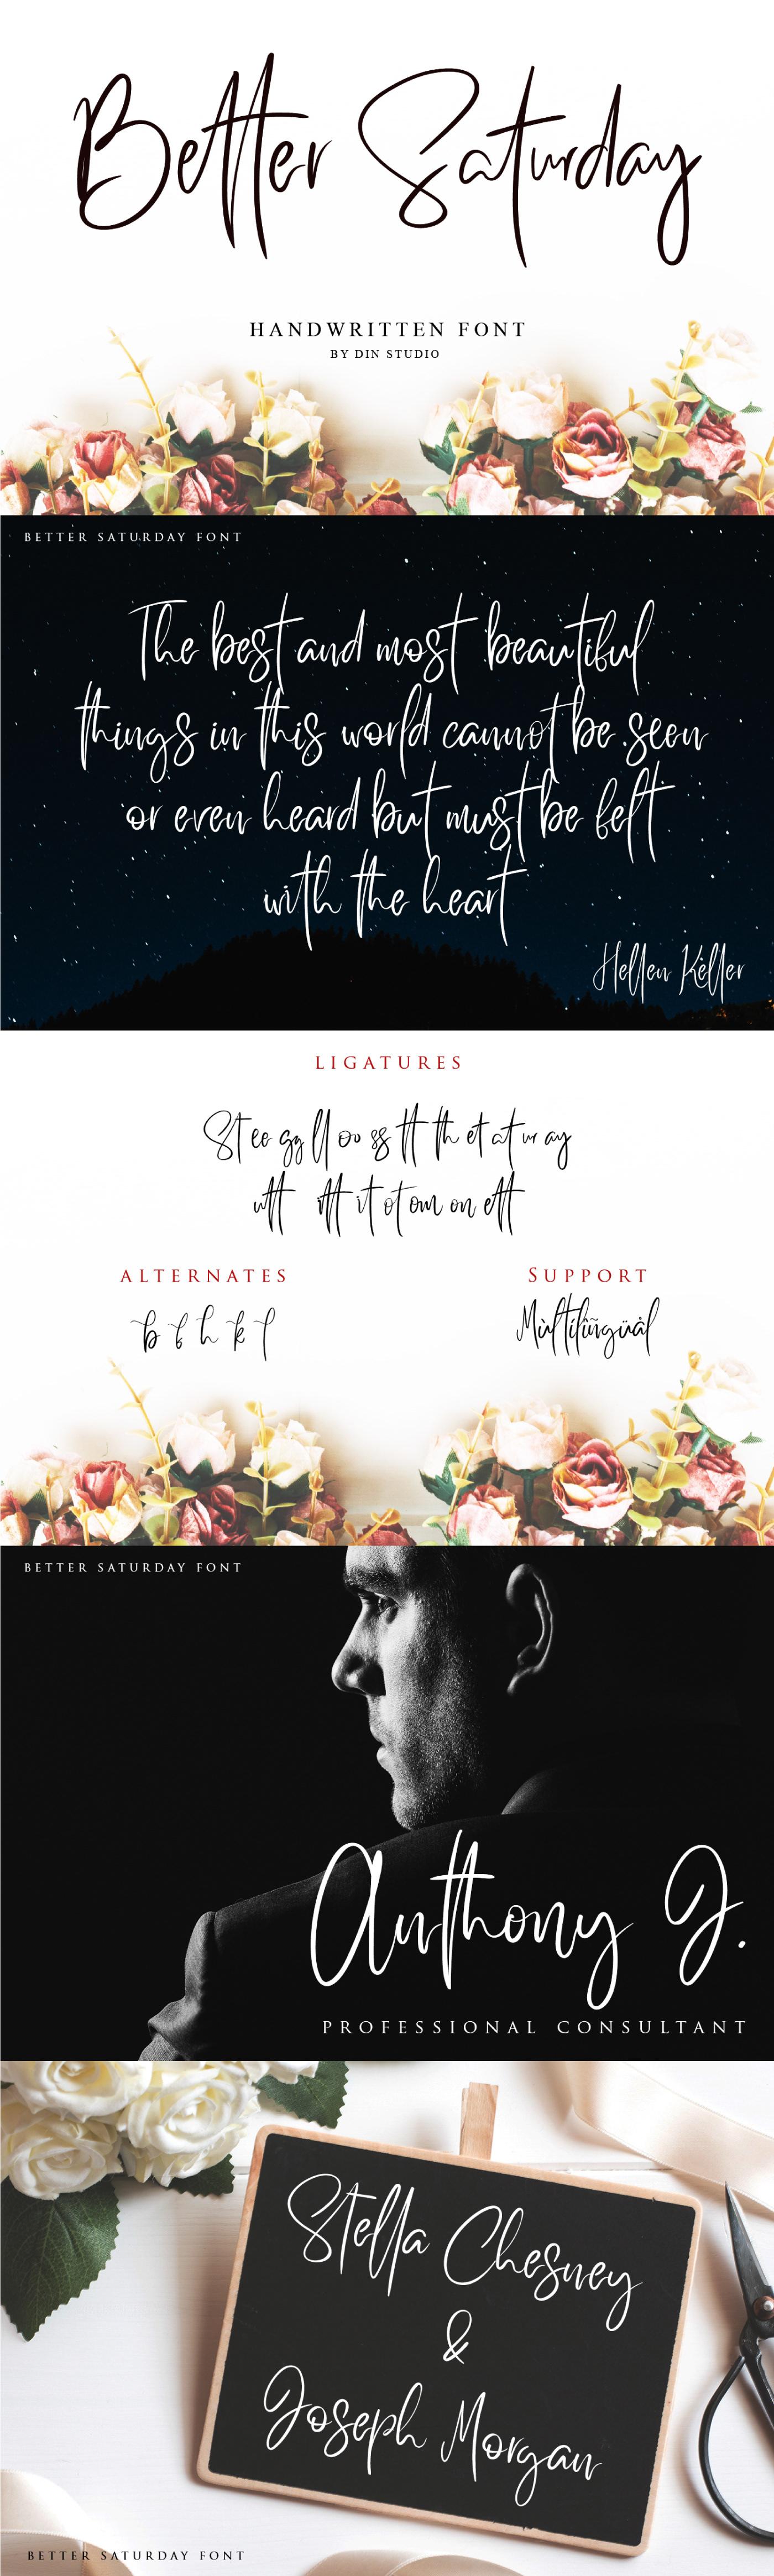 Шрифт – Better Saturday